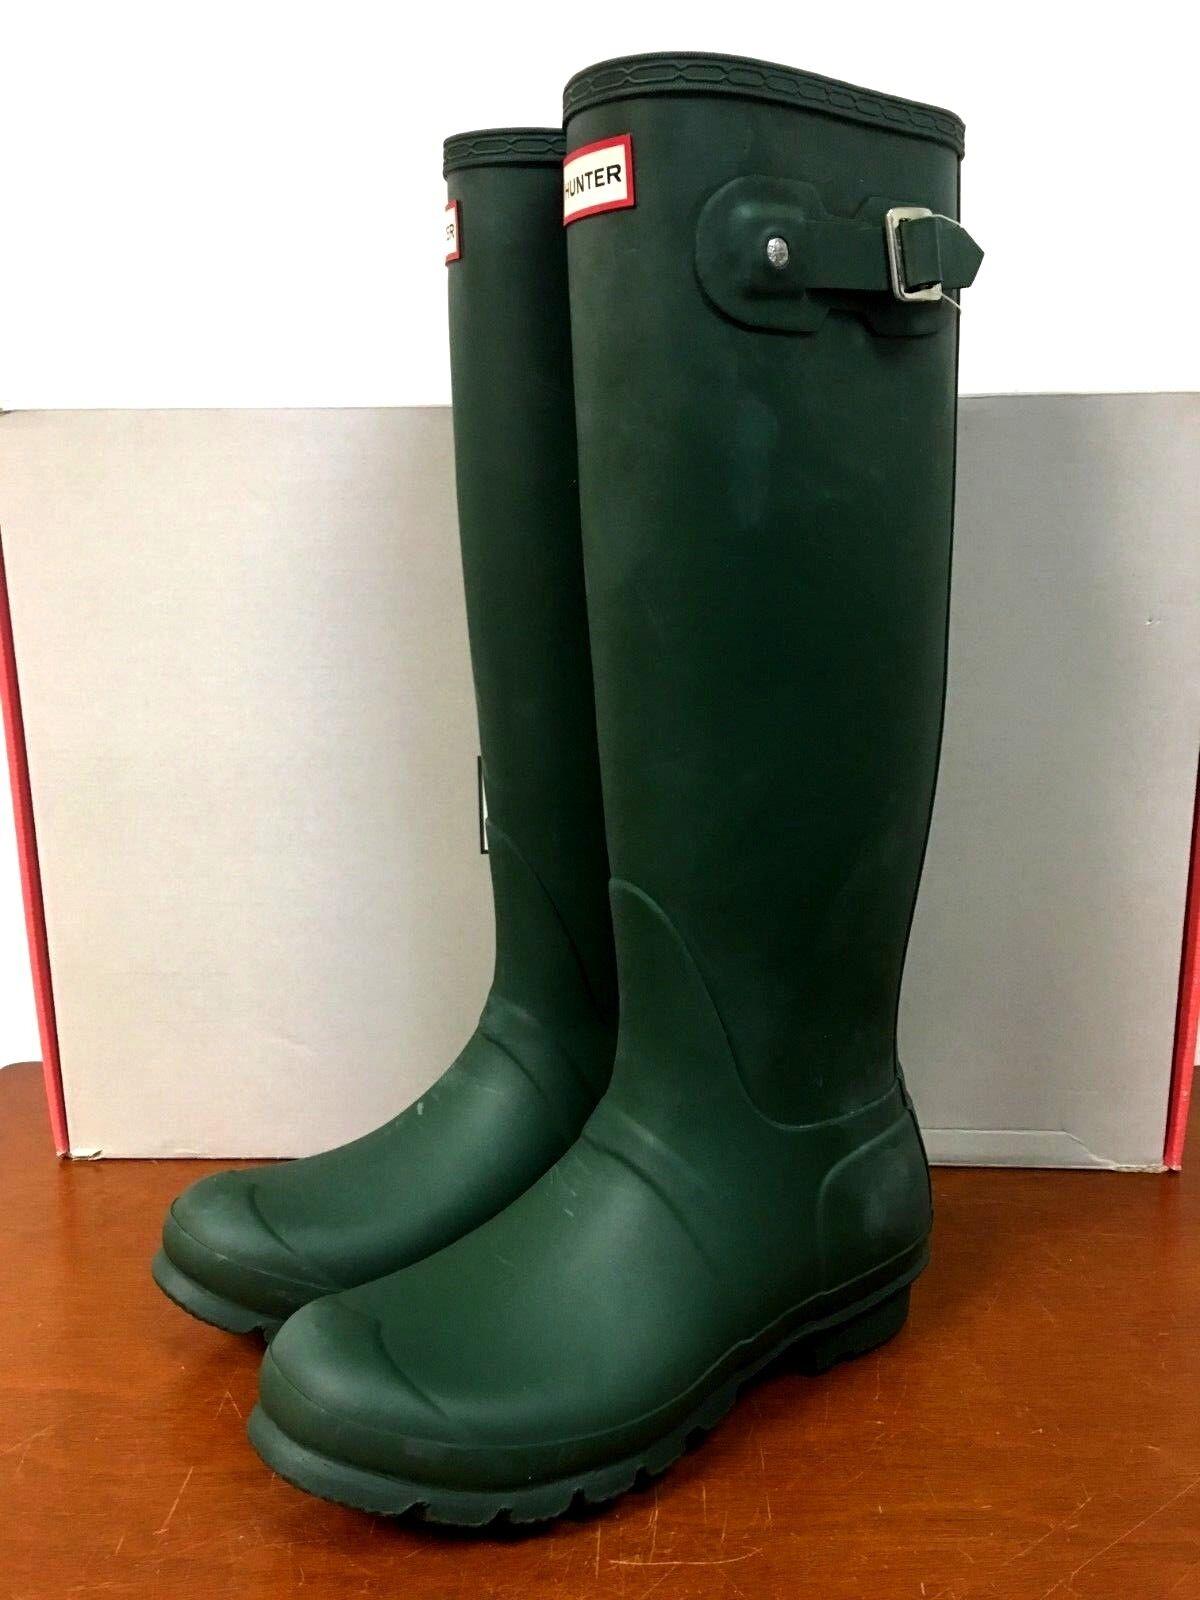 Hunter Original Tall botas De Lluvia-Mate verde - 8N_30